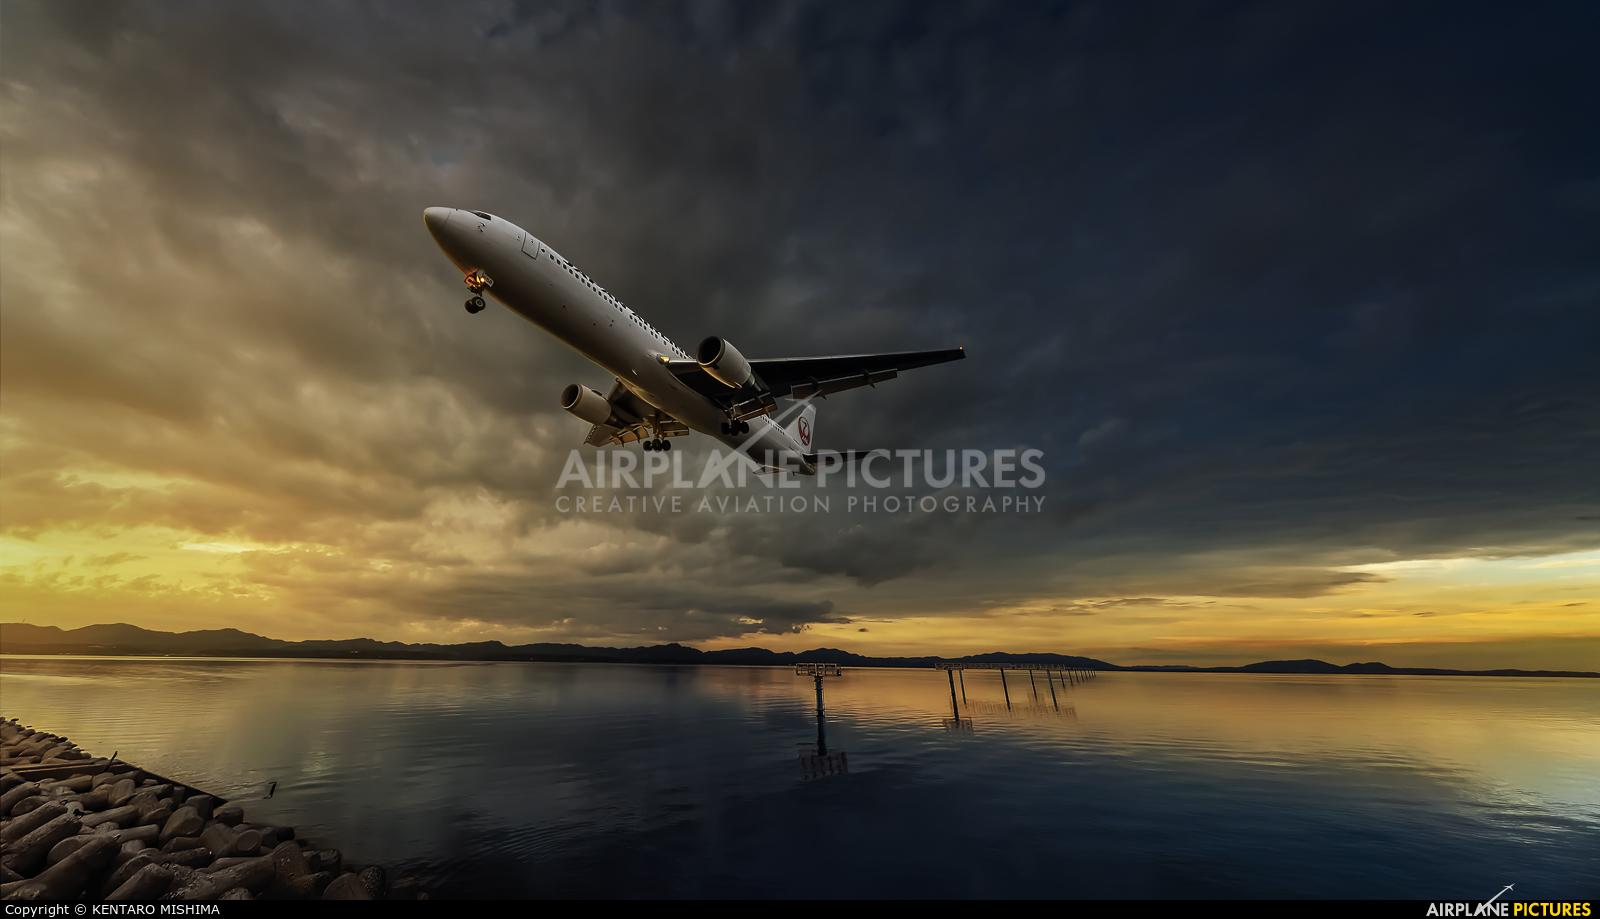 JAL - Japan Airlines JA658J aircraft at Izumo